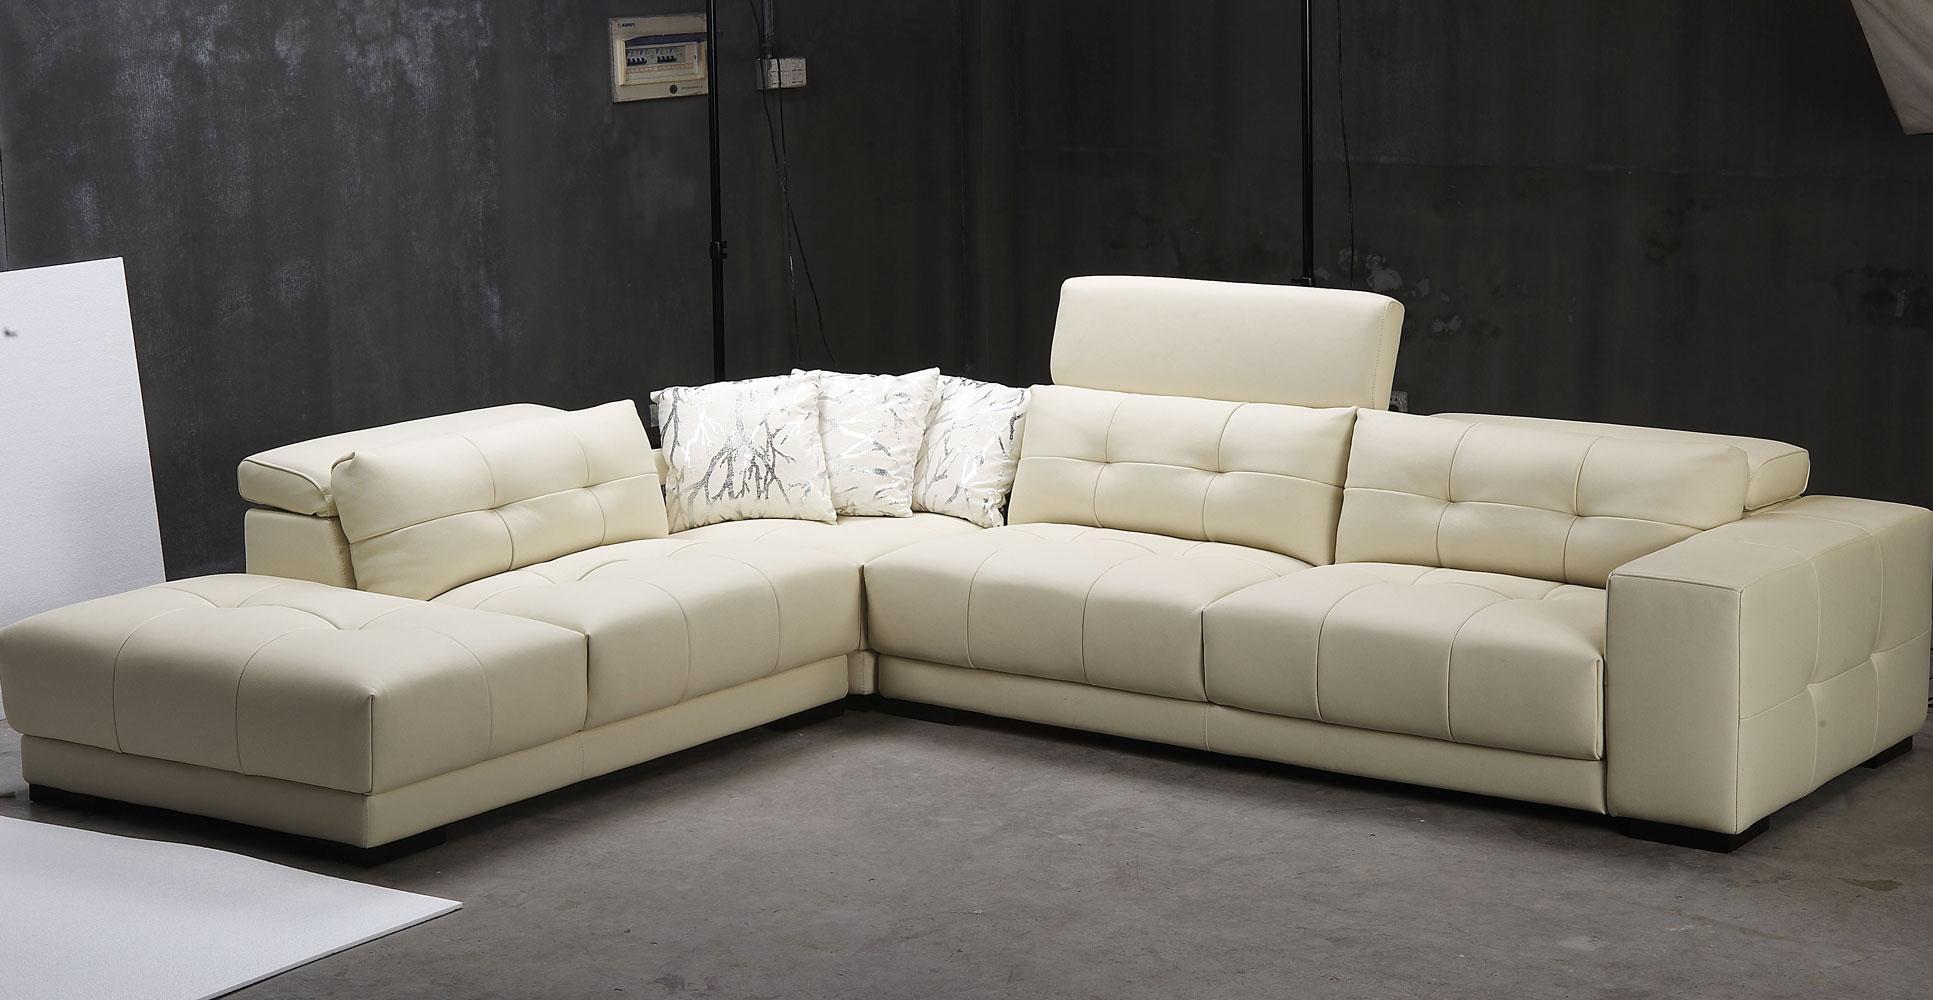 Bauhaus Leather Sectional Sofa Centerfieldbar Com : bauhaus sectional couch - Sectionals, Sofas & Couches